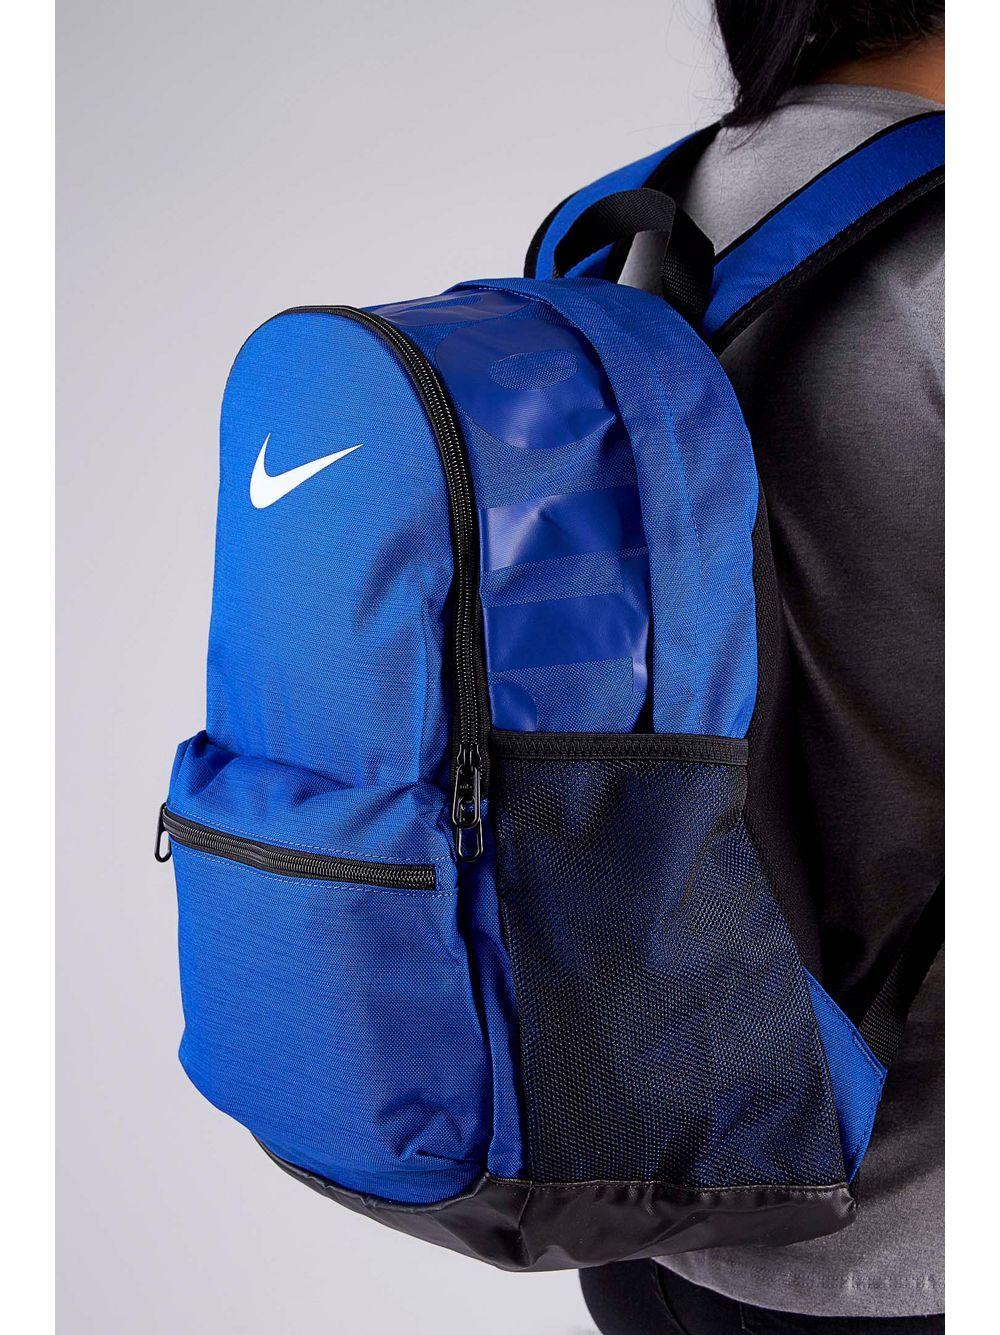 1b859f367 Previous. Mochila-Nike-Brasilia-Backpack-Marinho ...